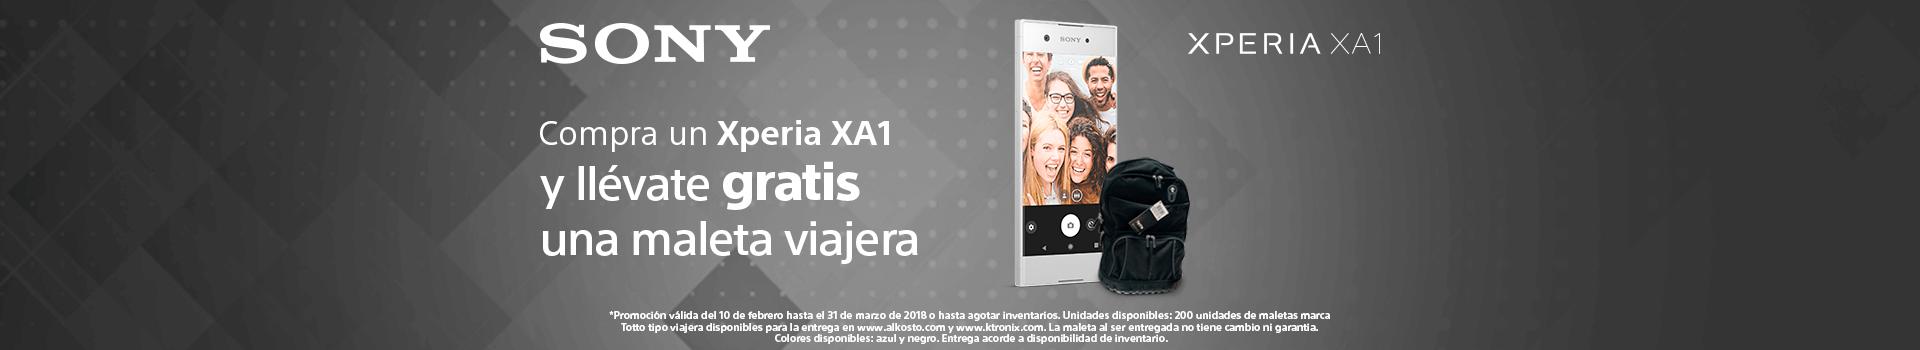 CAT KT -1-celulares-SONYMaletaTOTTO-cat-febrero-15/25